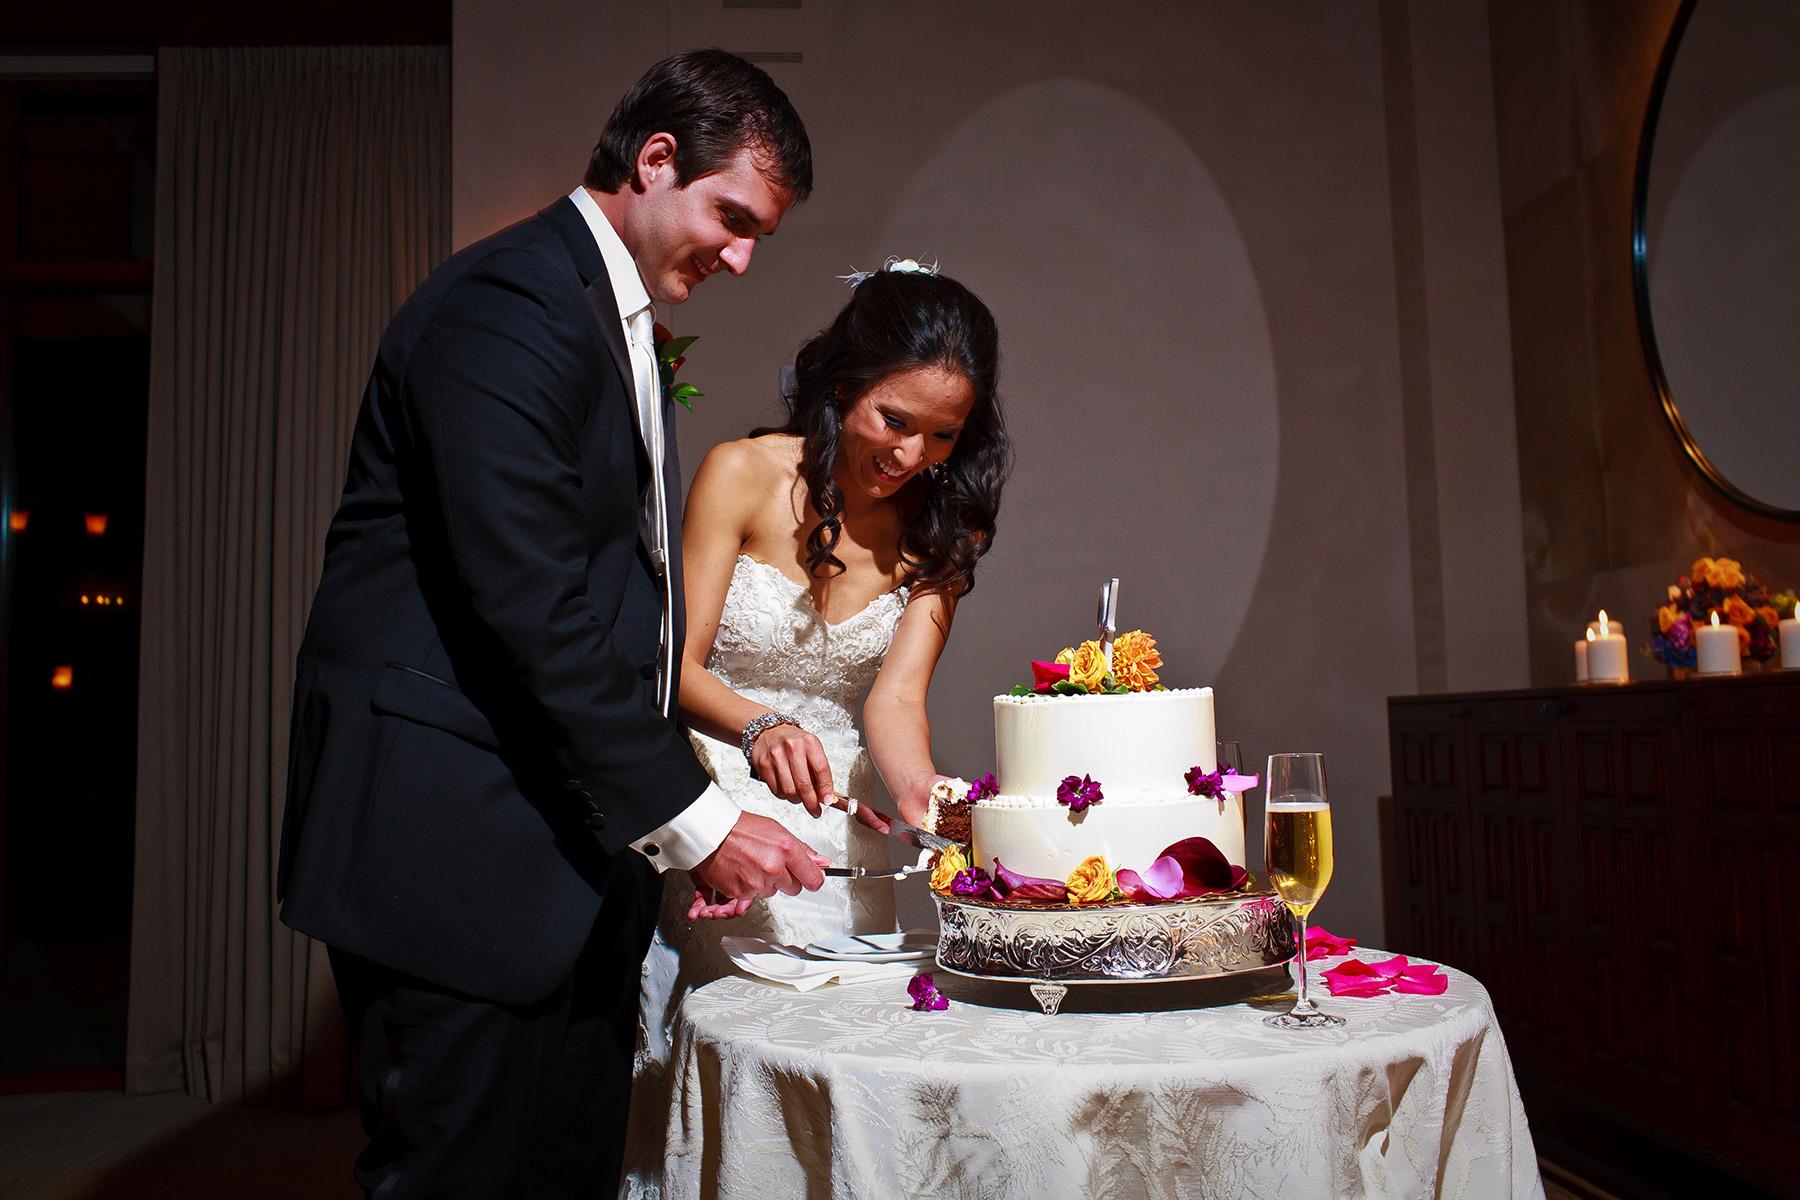 Tabitha-Dallas-wedding-four-seasons-resort-rancho-encantado-santa-fe-new-mexico-1071